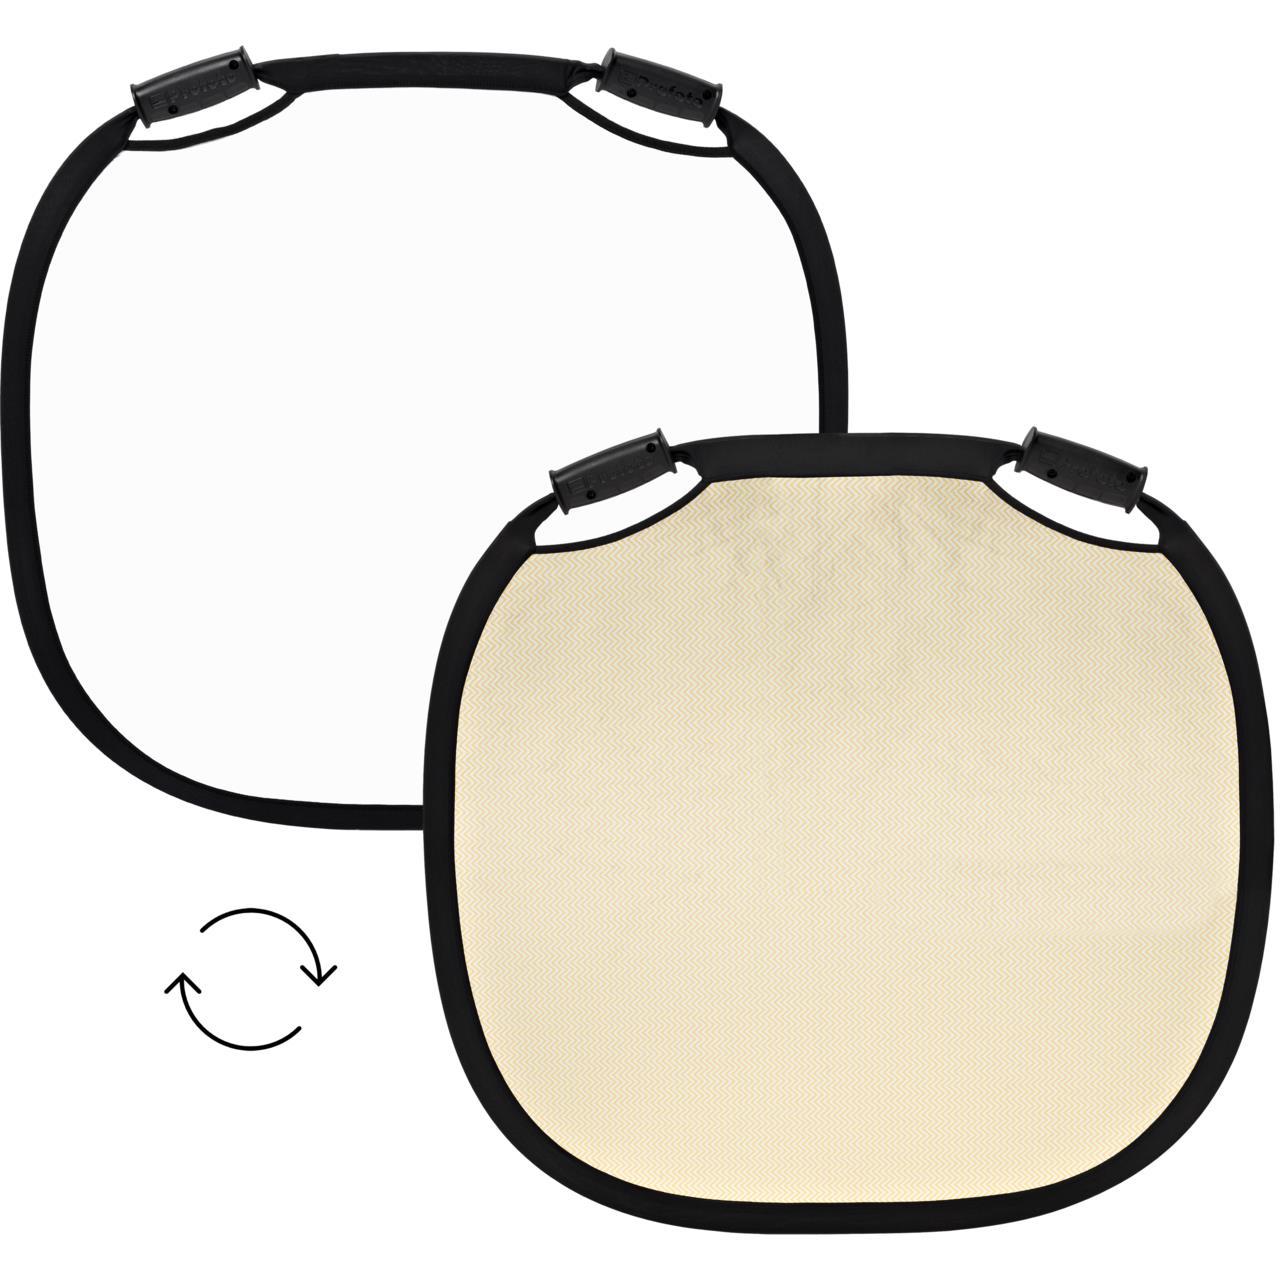 Profoto Collapsible Reflector White/Sunsilver L - 8€ Day/Unit